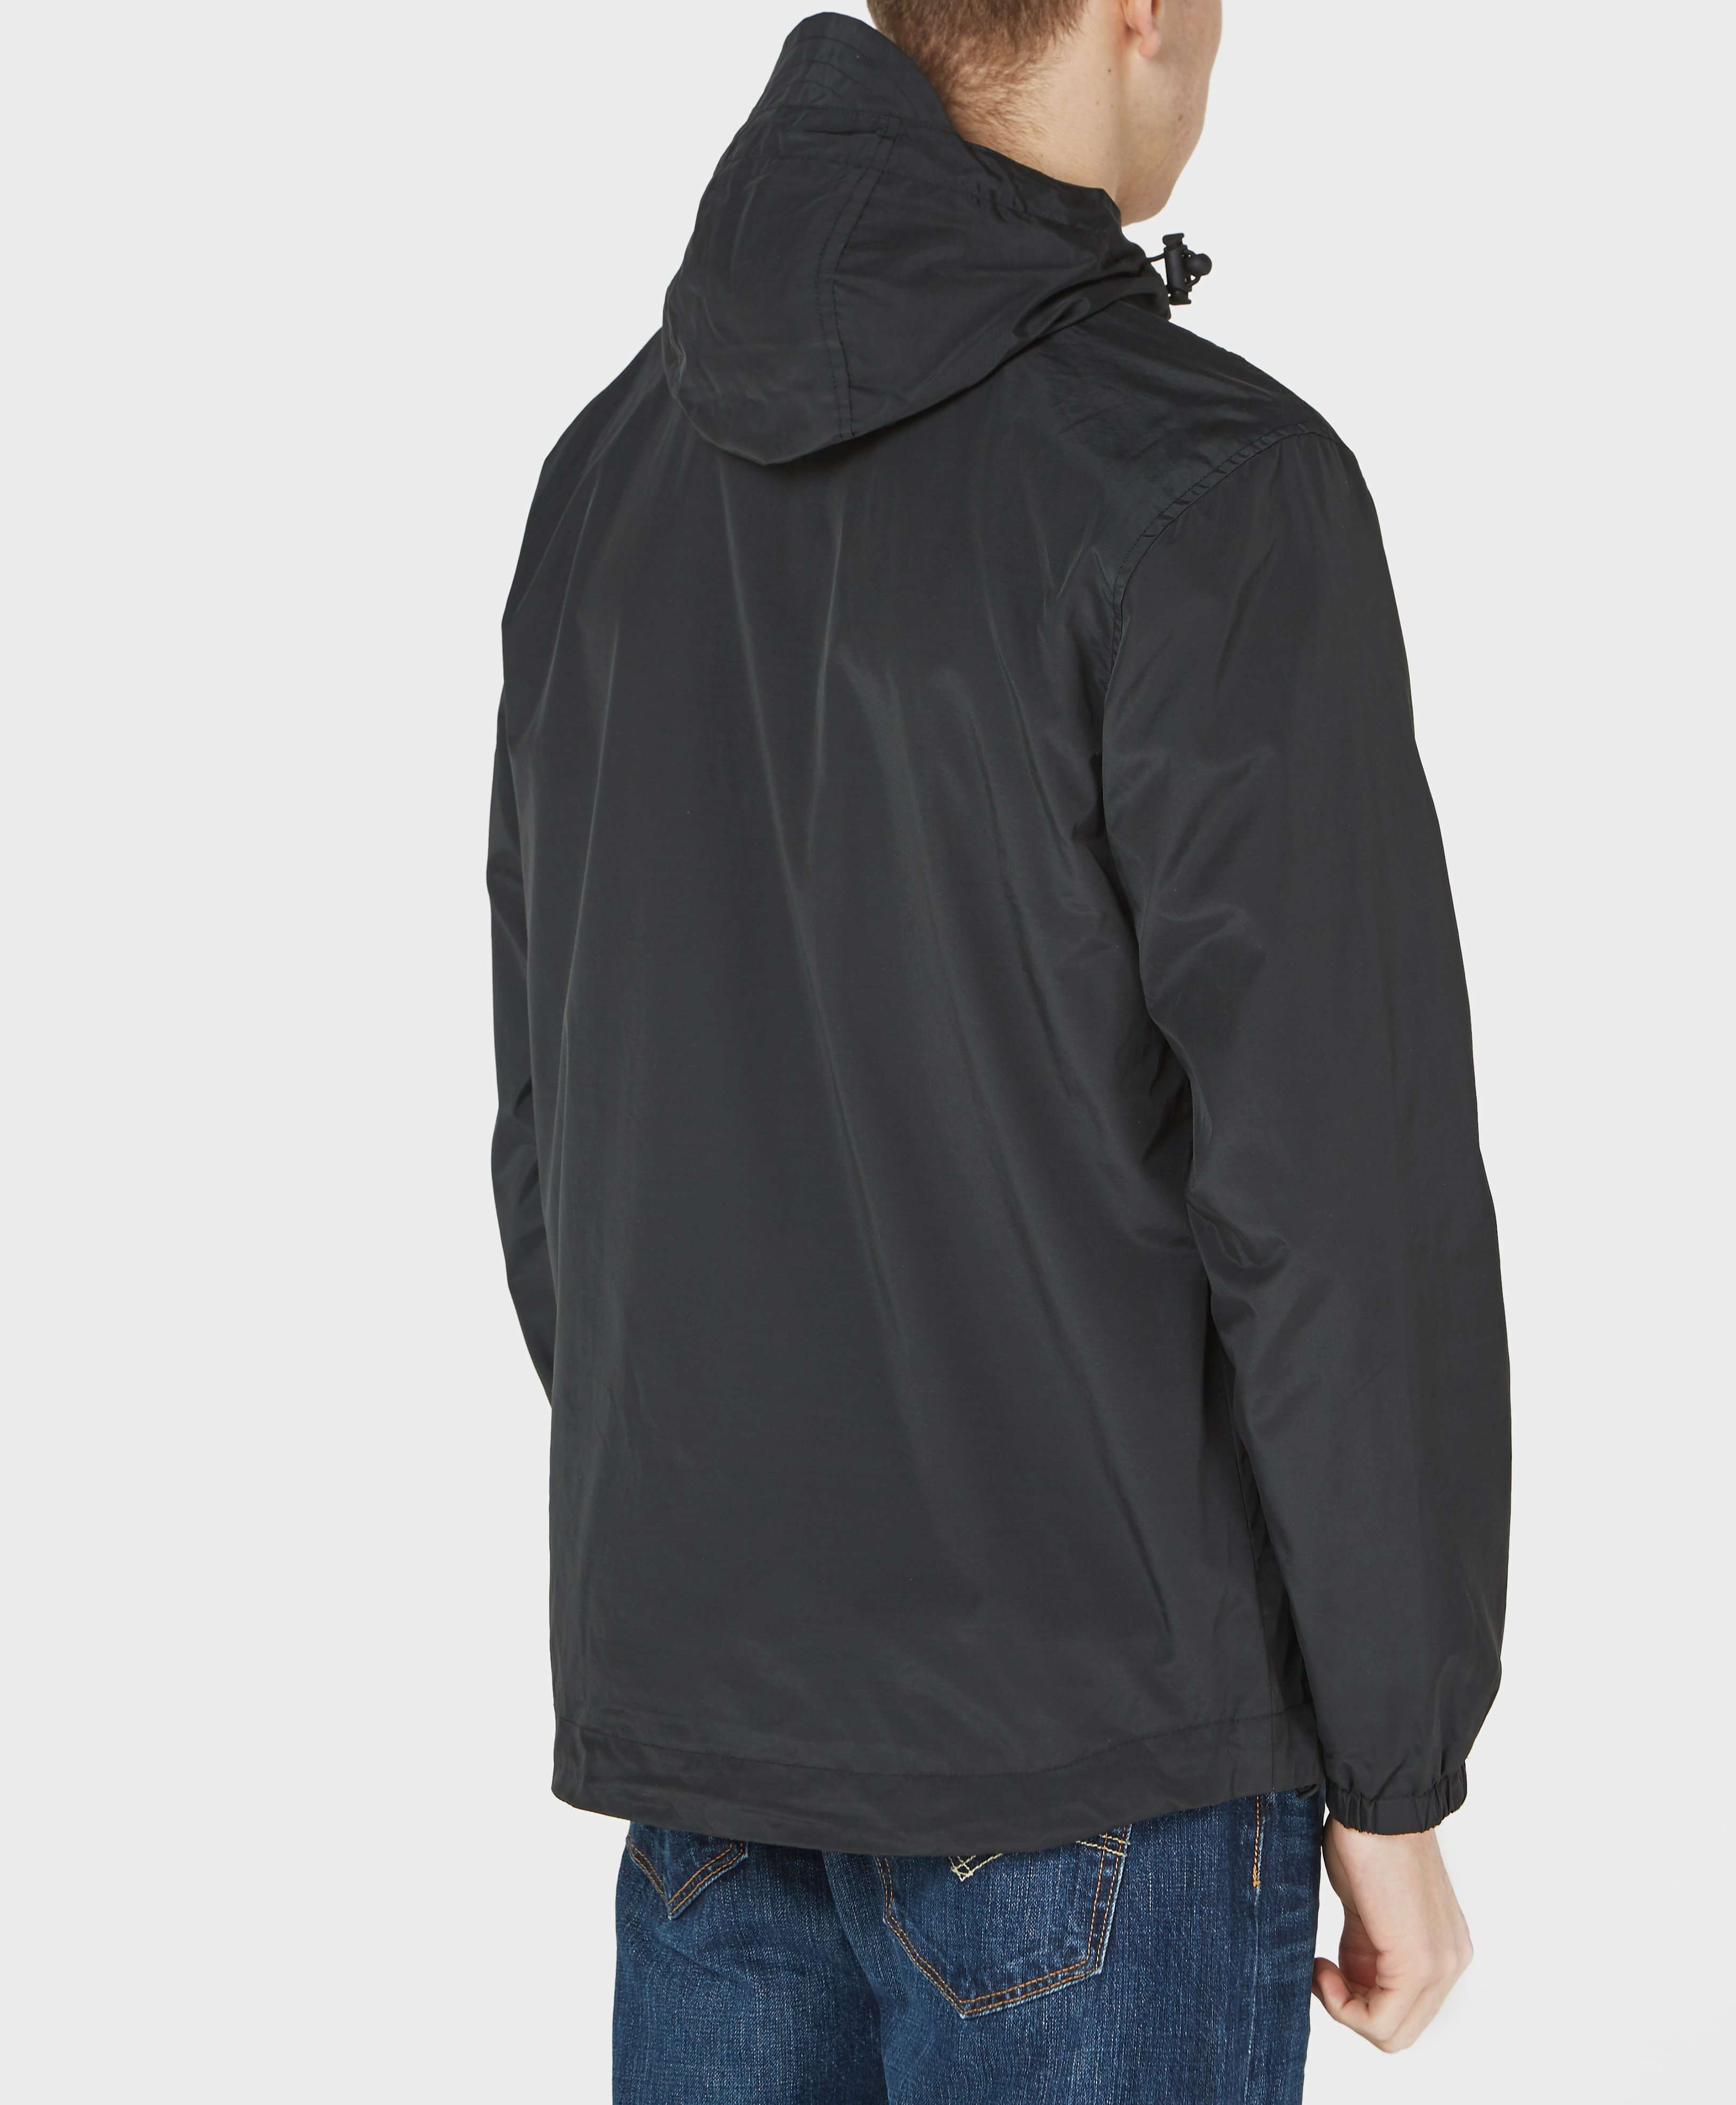 Lyle & Scott Overhead Lightweight Jacket